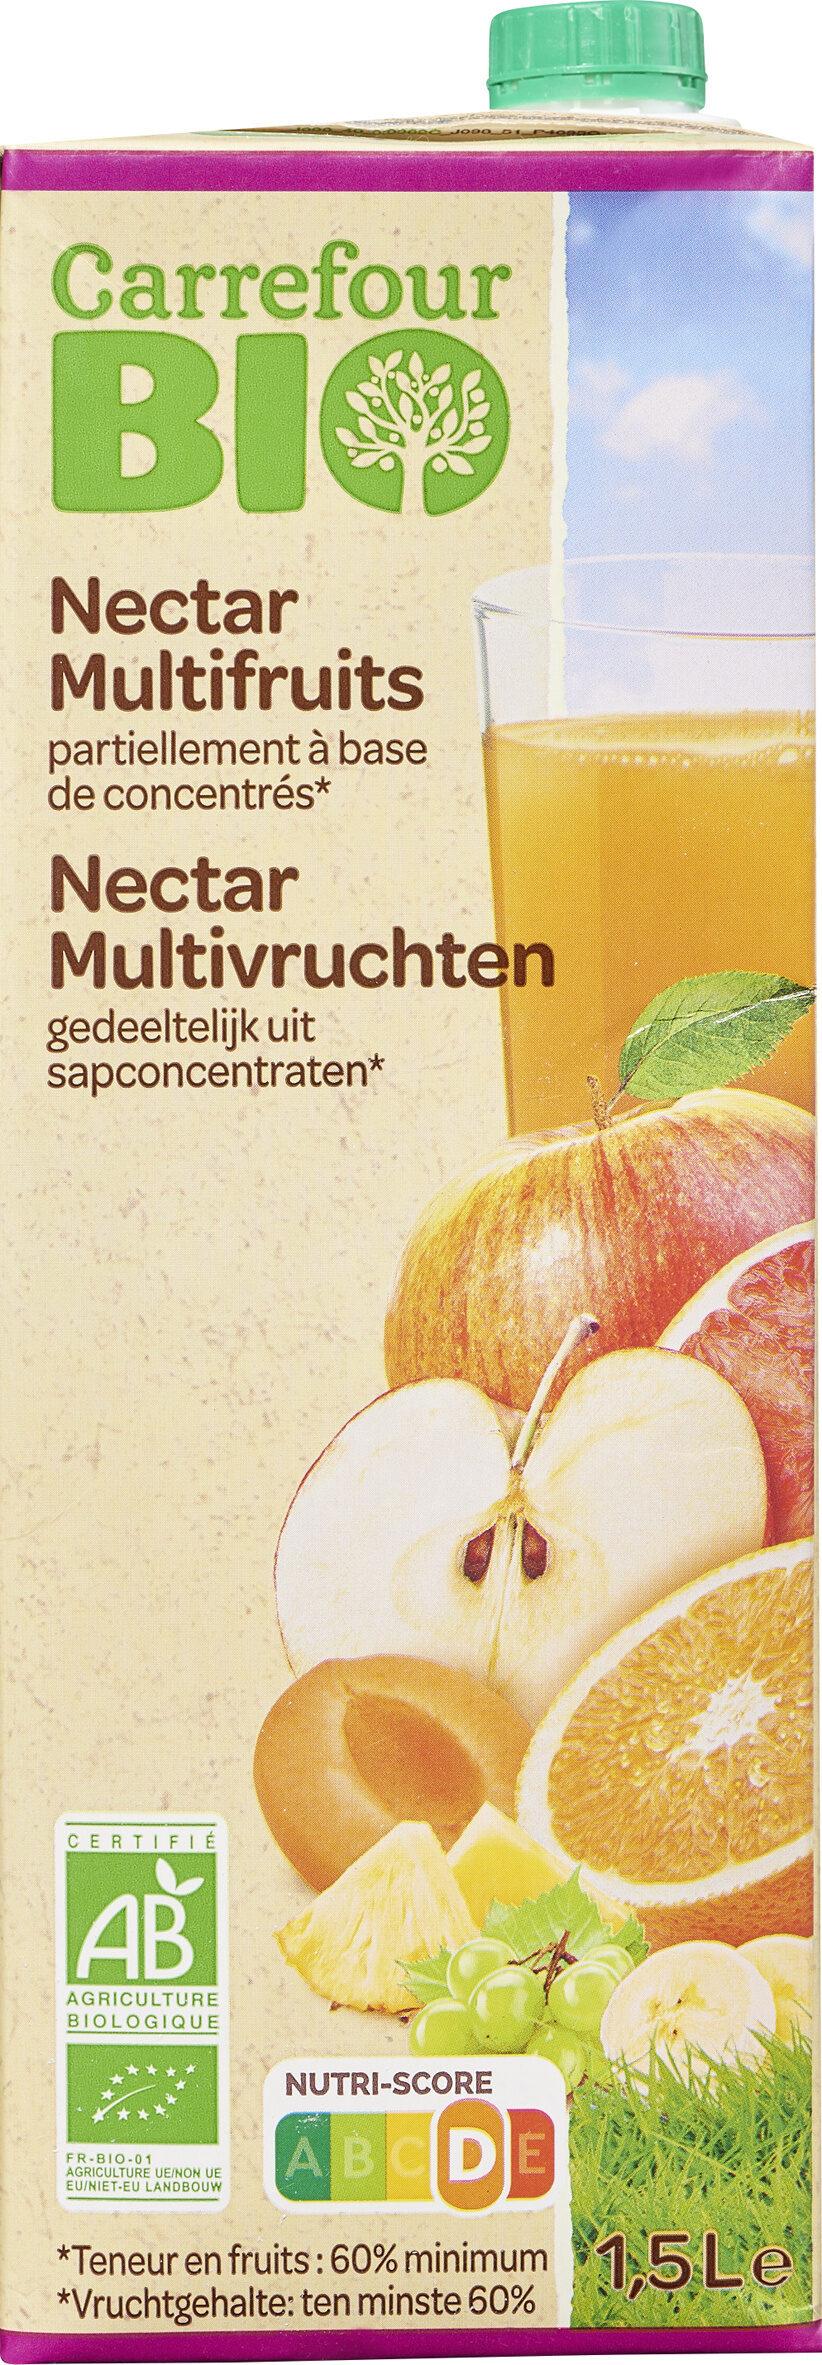 Nectar Multifruits - Prodotto - fr